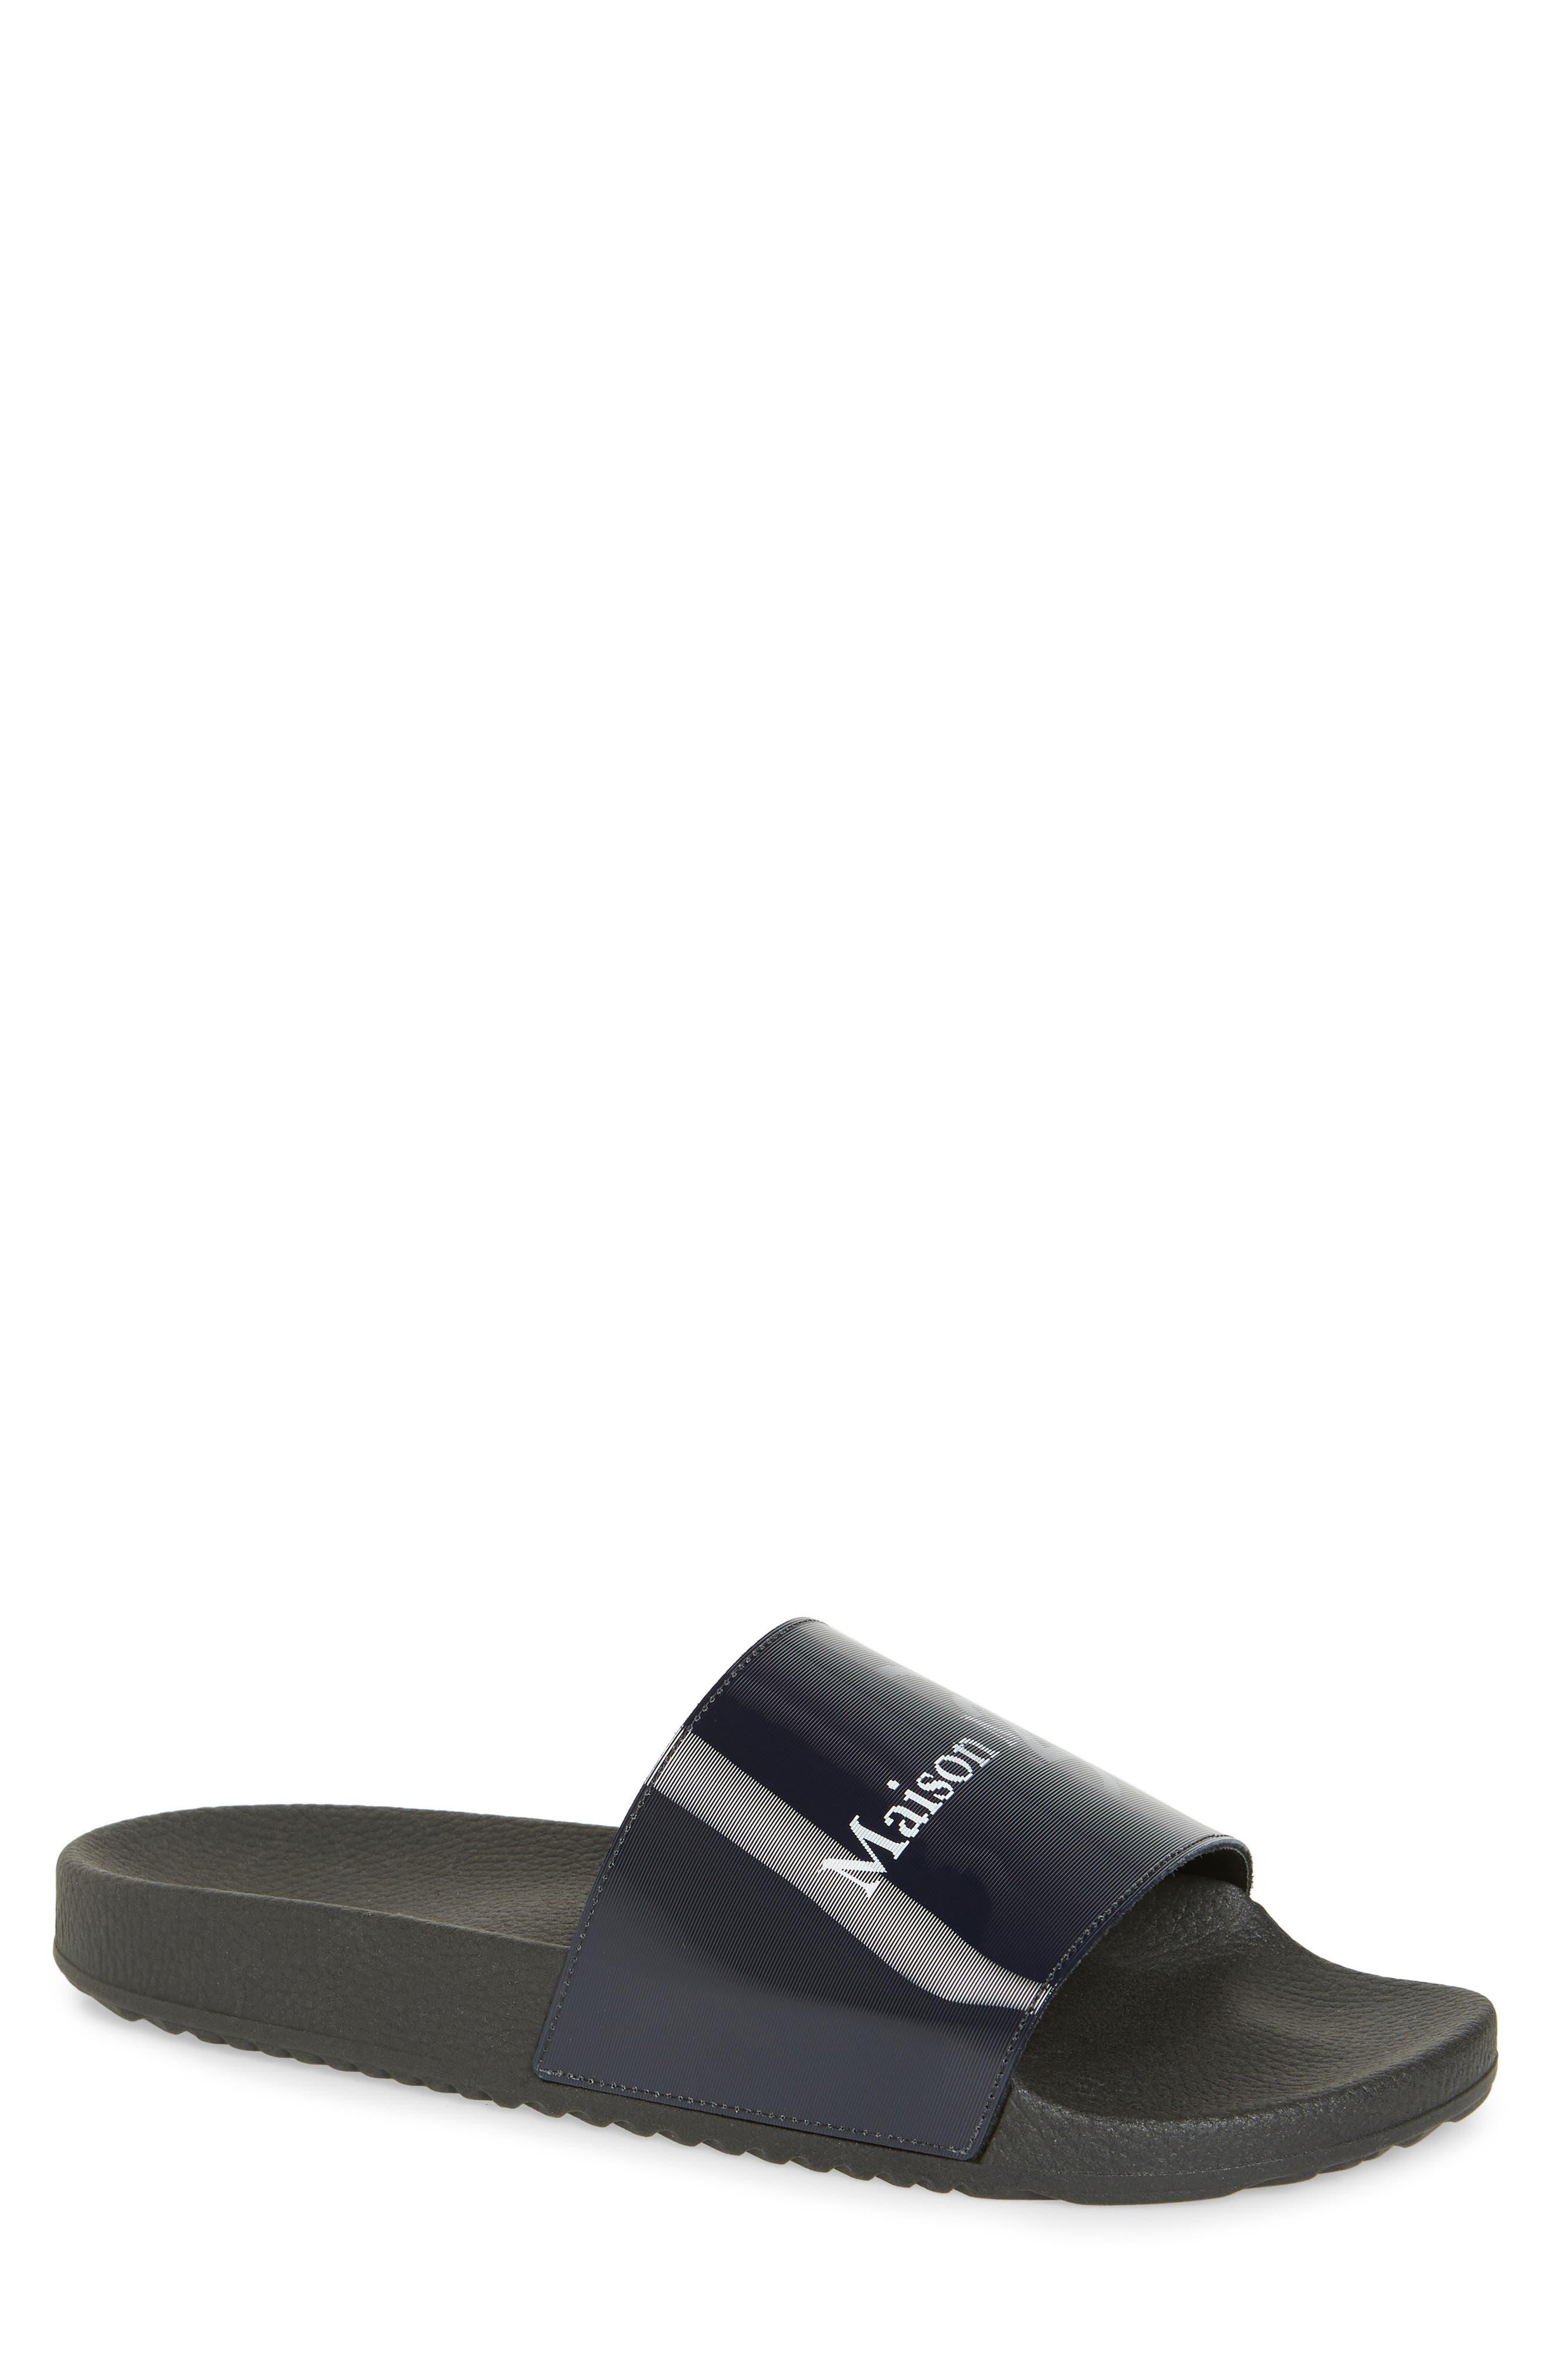 Pool Slide Sandal, Main, color, BLACK/ OFF WHITE